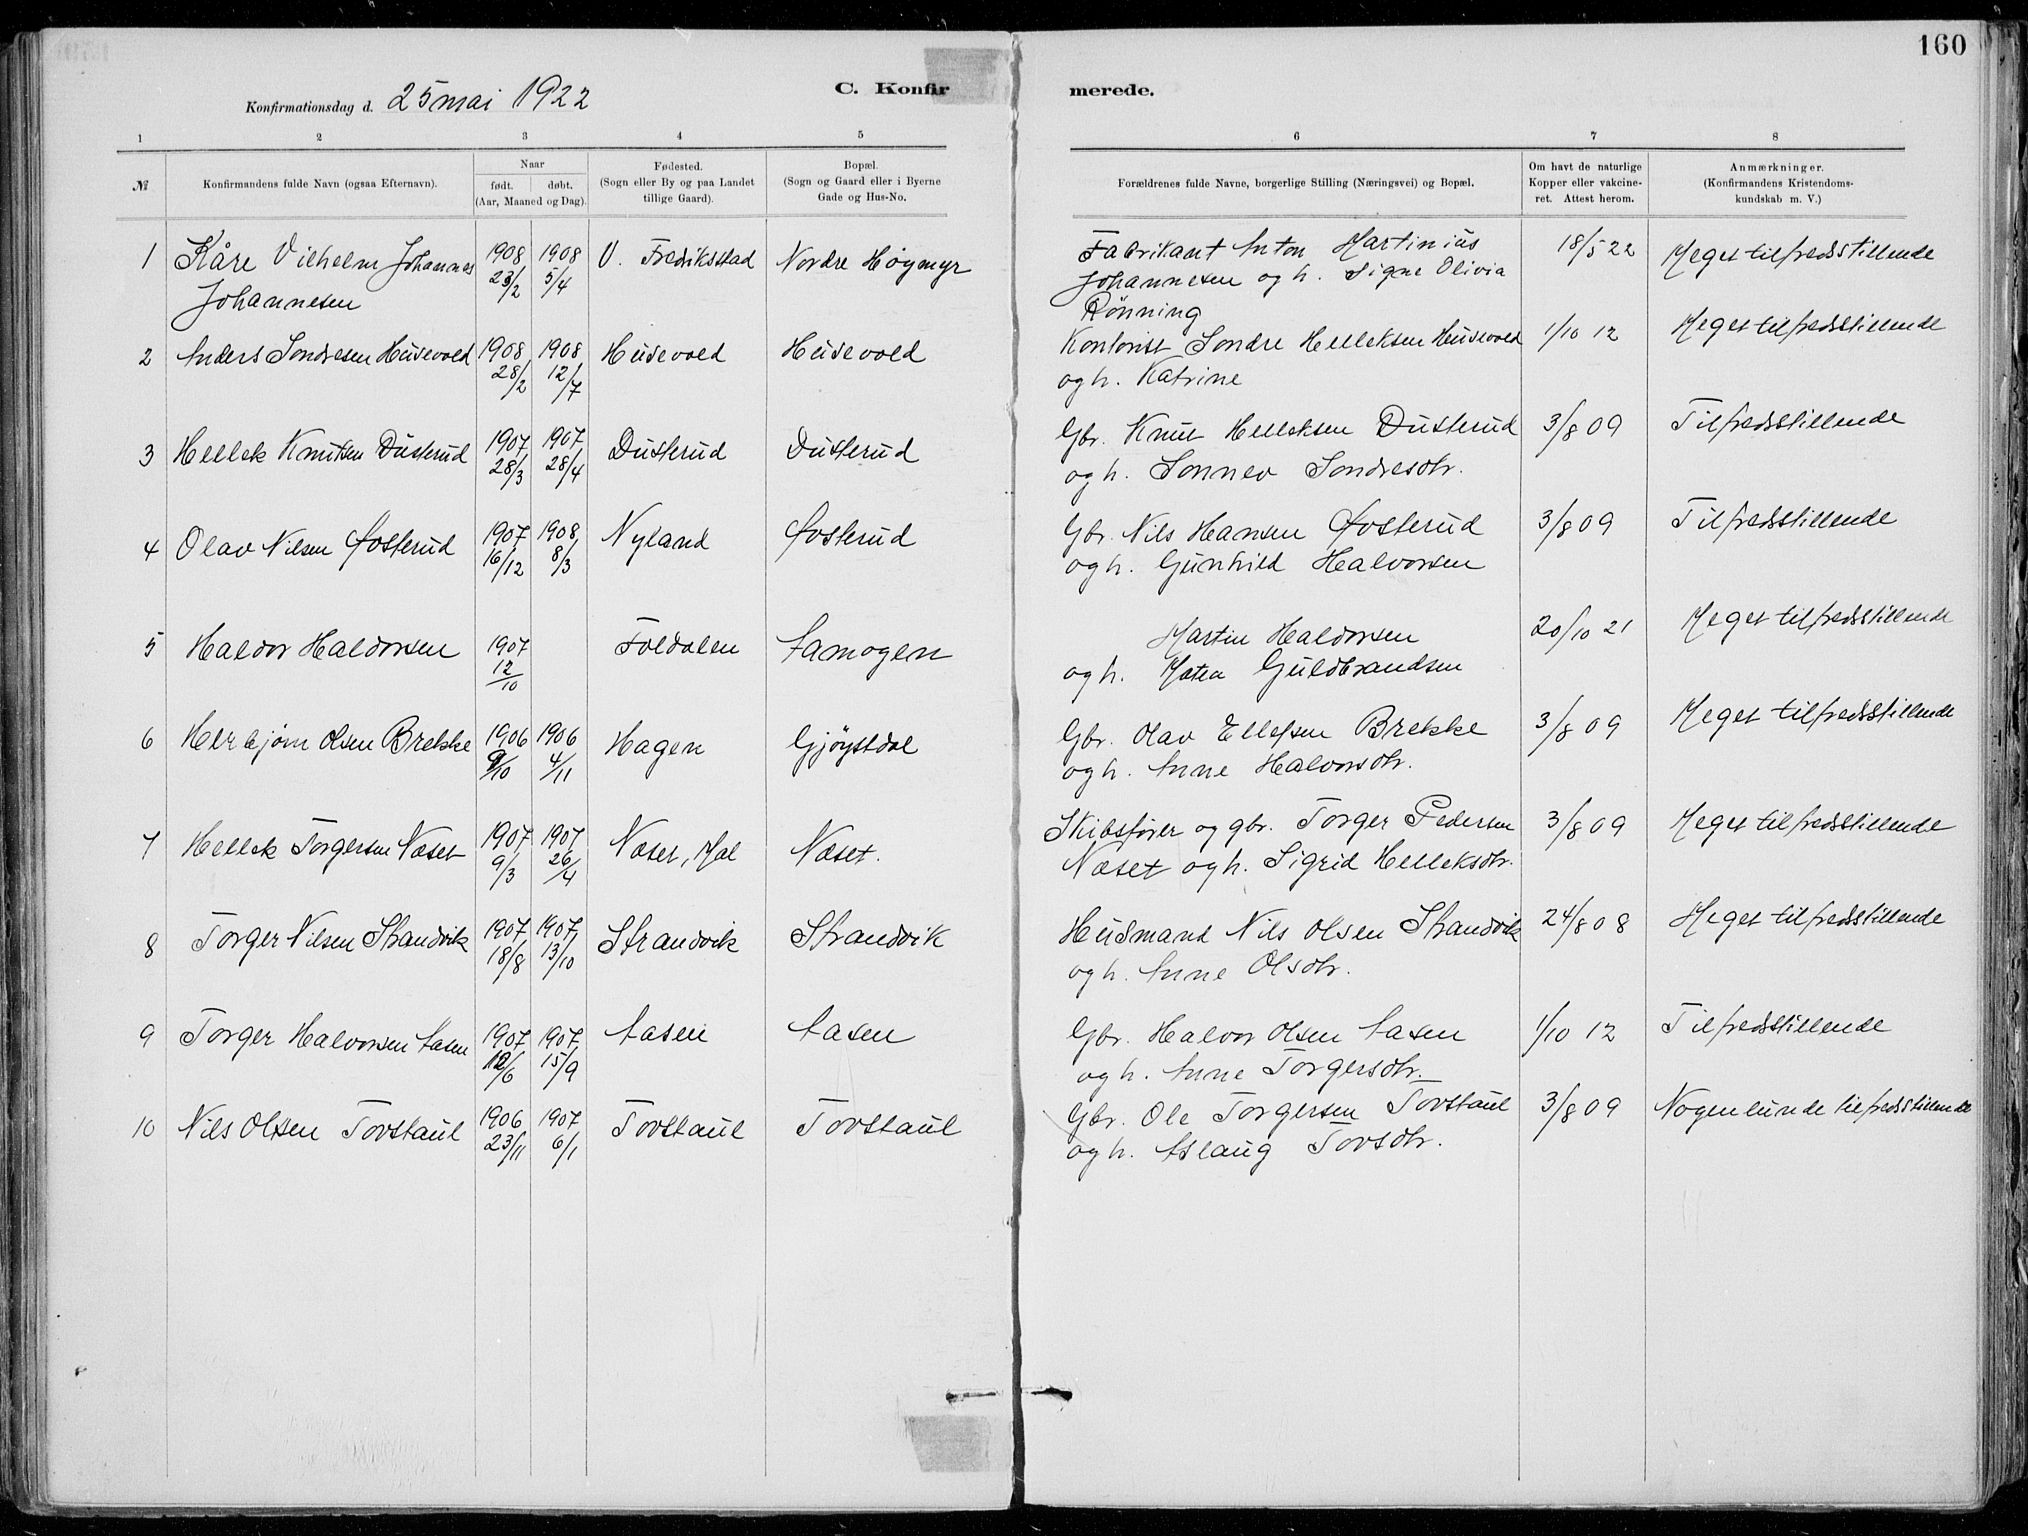 SAKO, Tinn kirkebøker, F/Fa/L0007: Ministerialbok nr. I 7, 1878-1922, s. 160